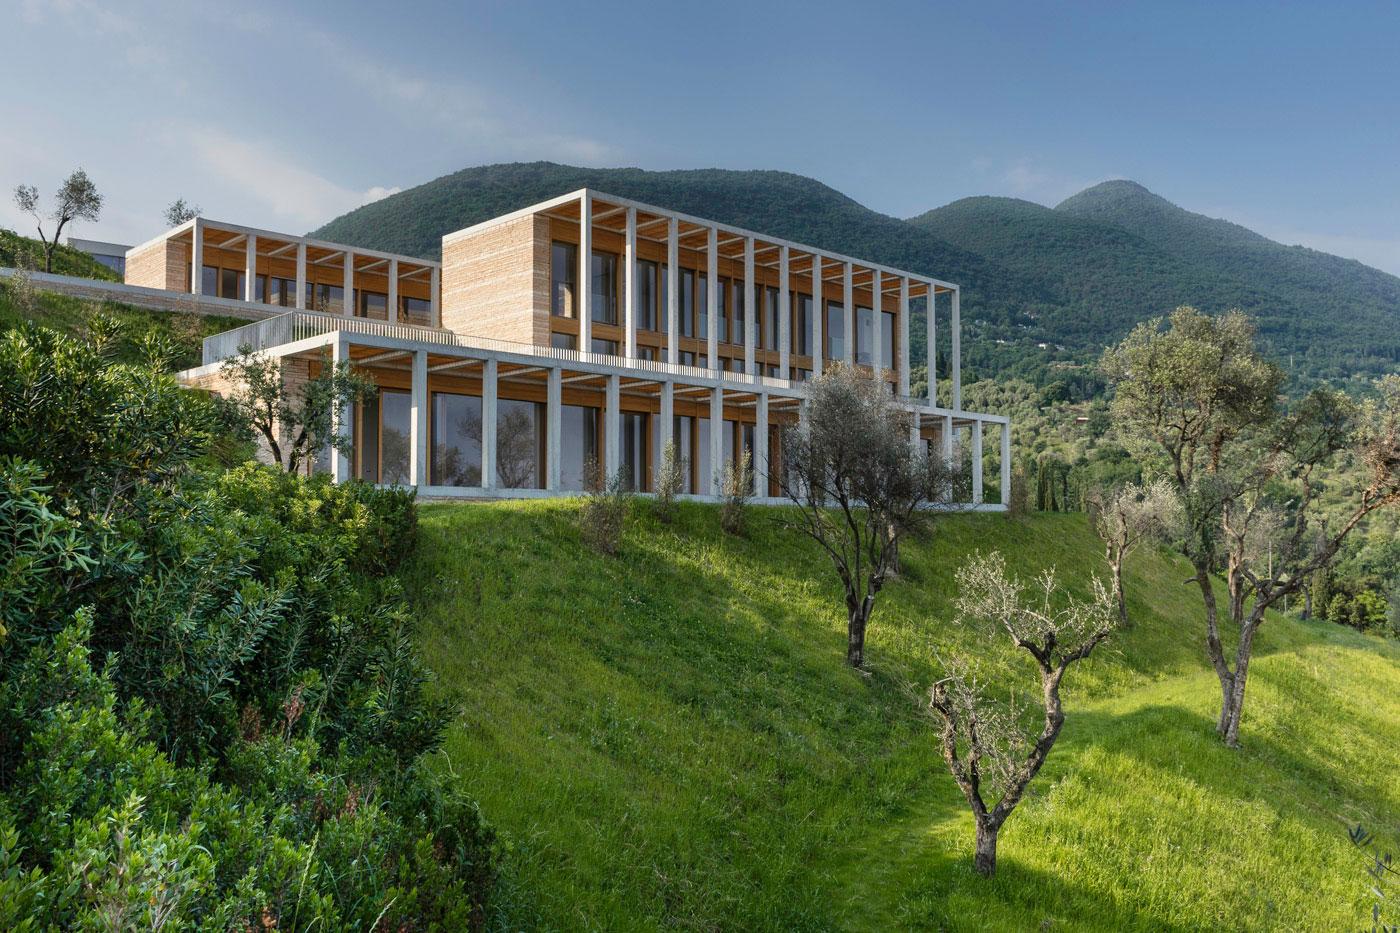 Pillared facade of Villa Eden by David Chipperfield Architects